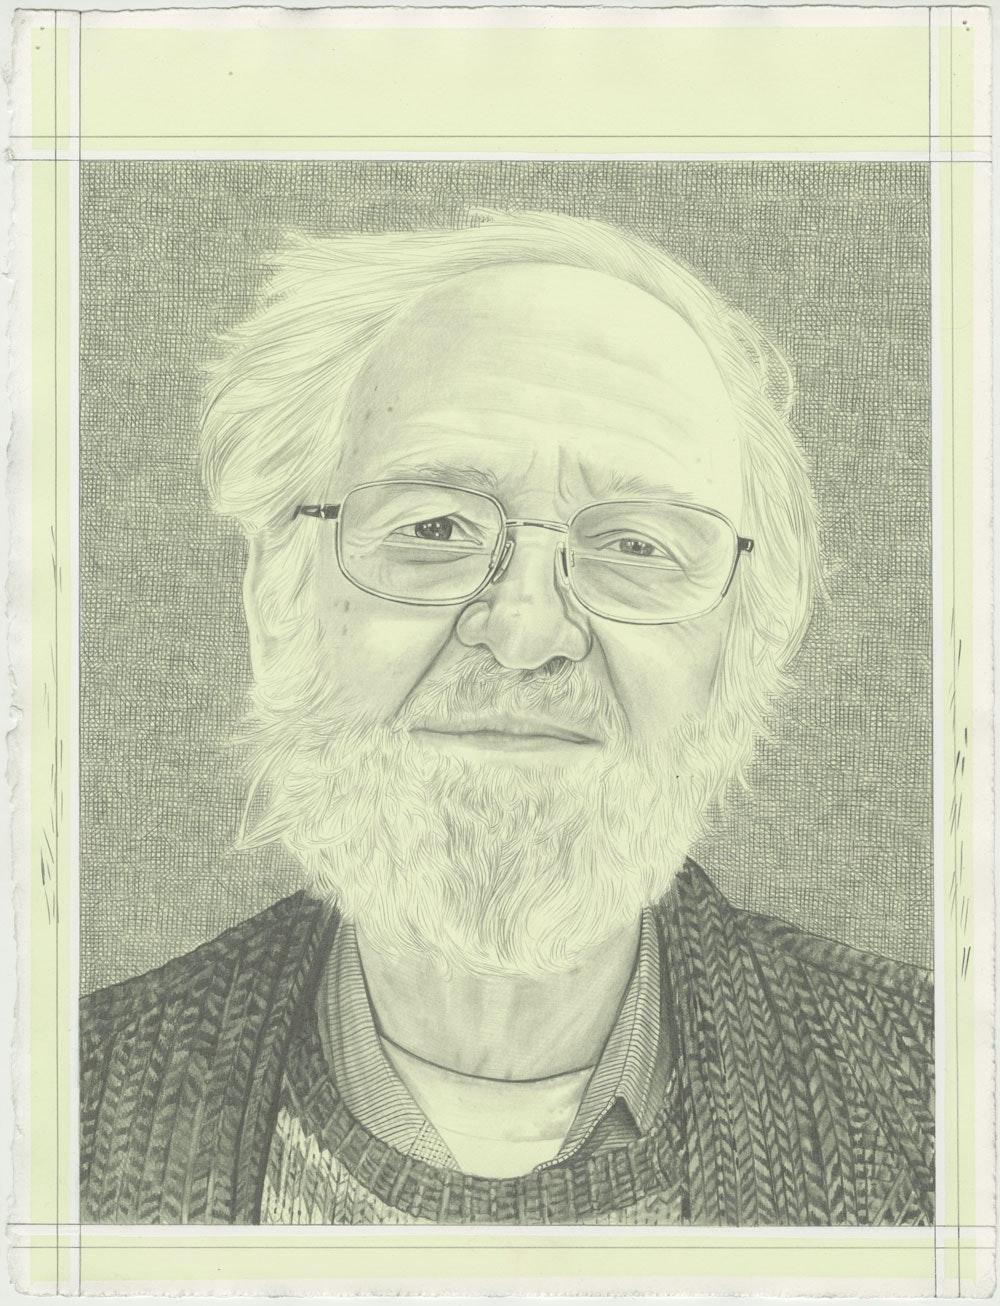 Jim Melchert, pencil on paper by Phong H. Bui.